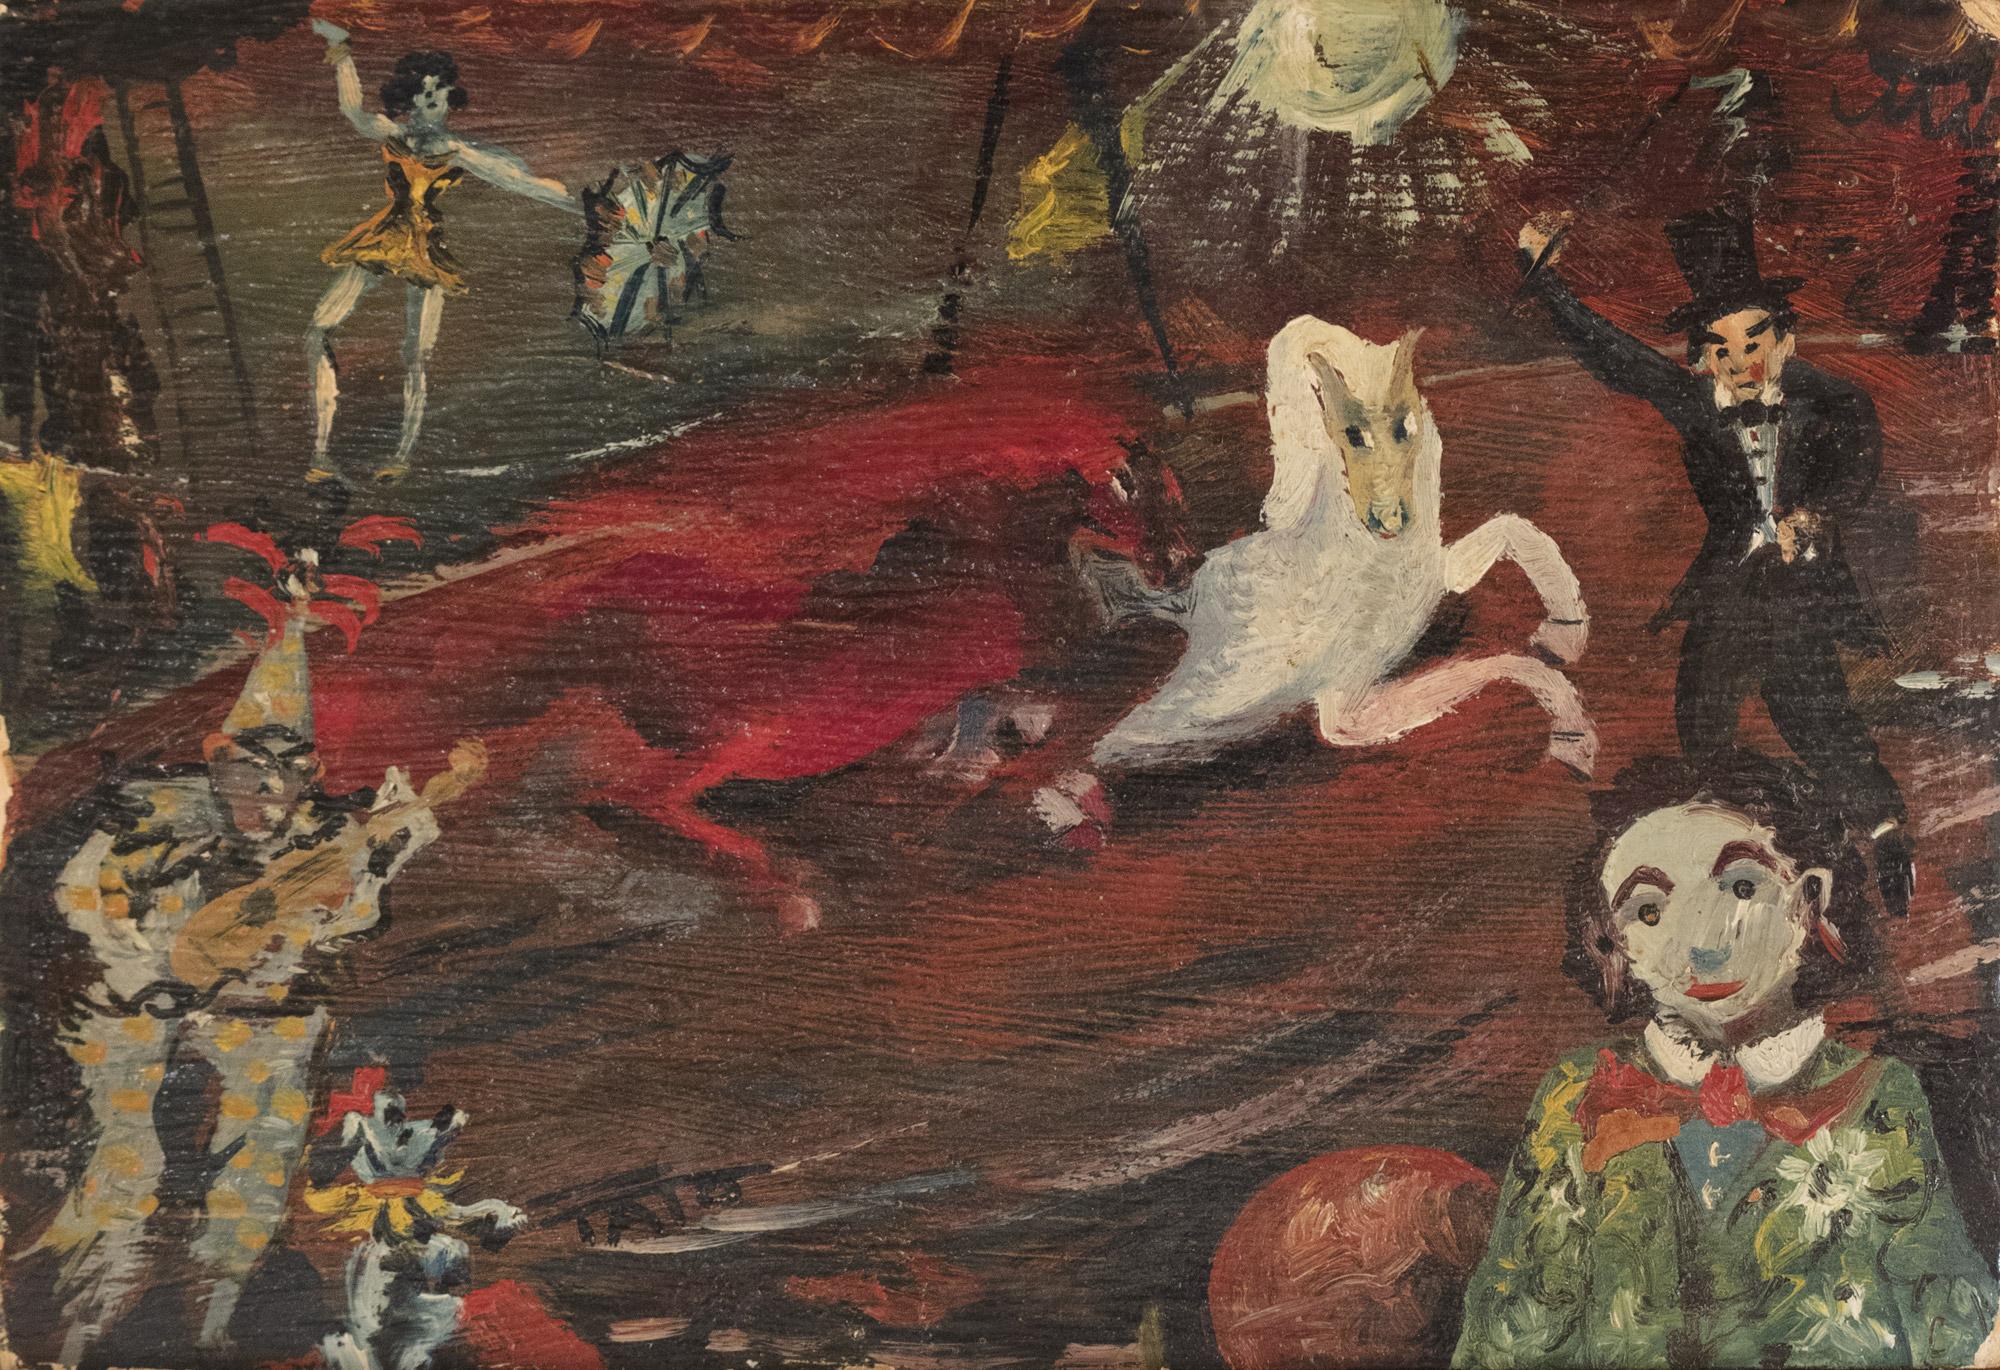 Circo equestre